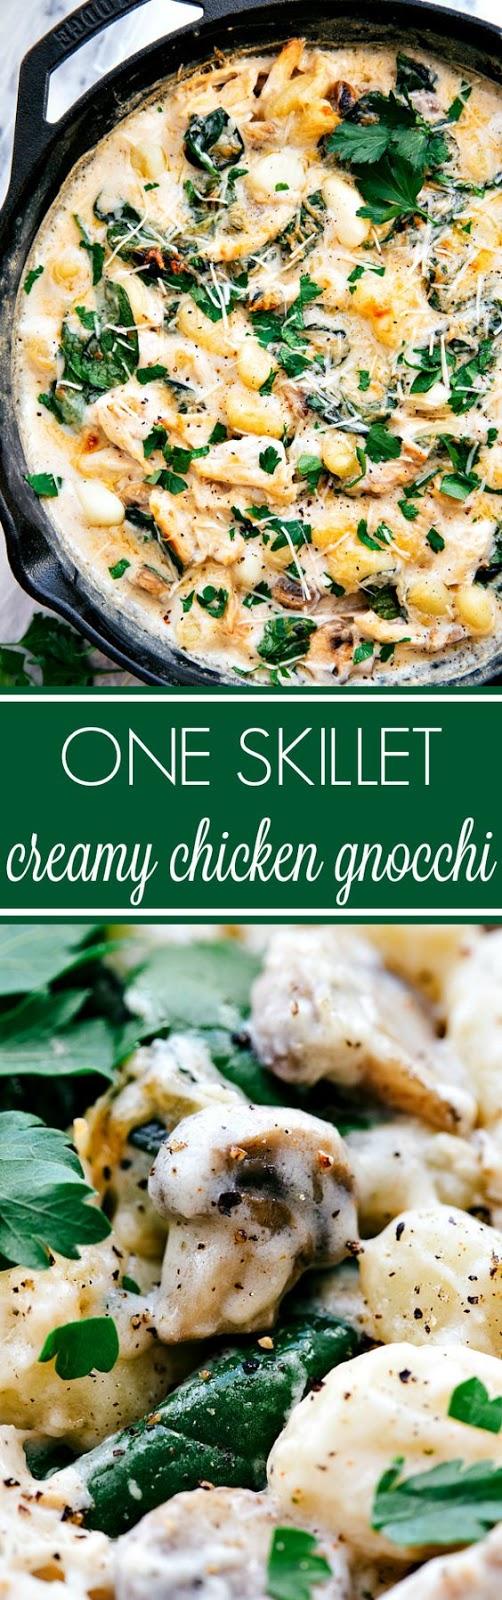 One Skillet Chicken and Spinach Gnocchi